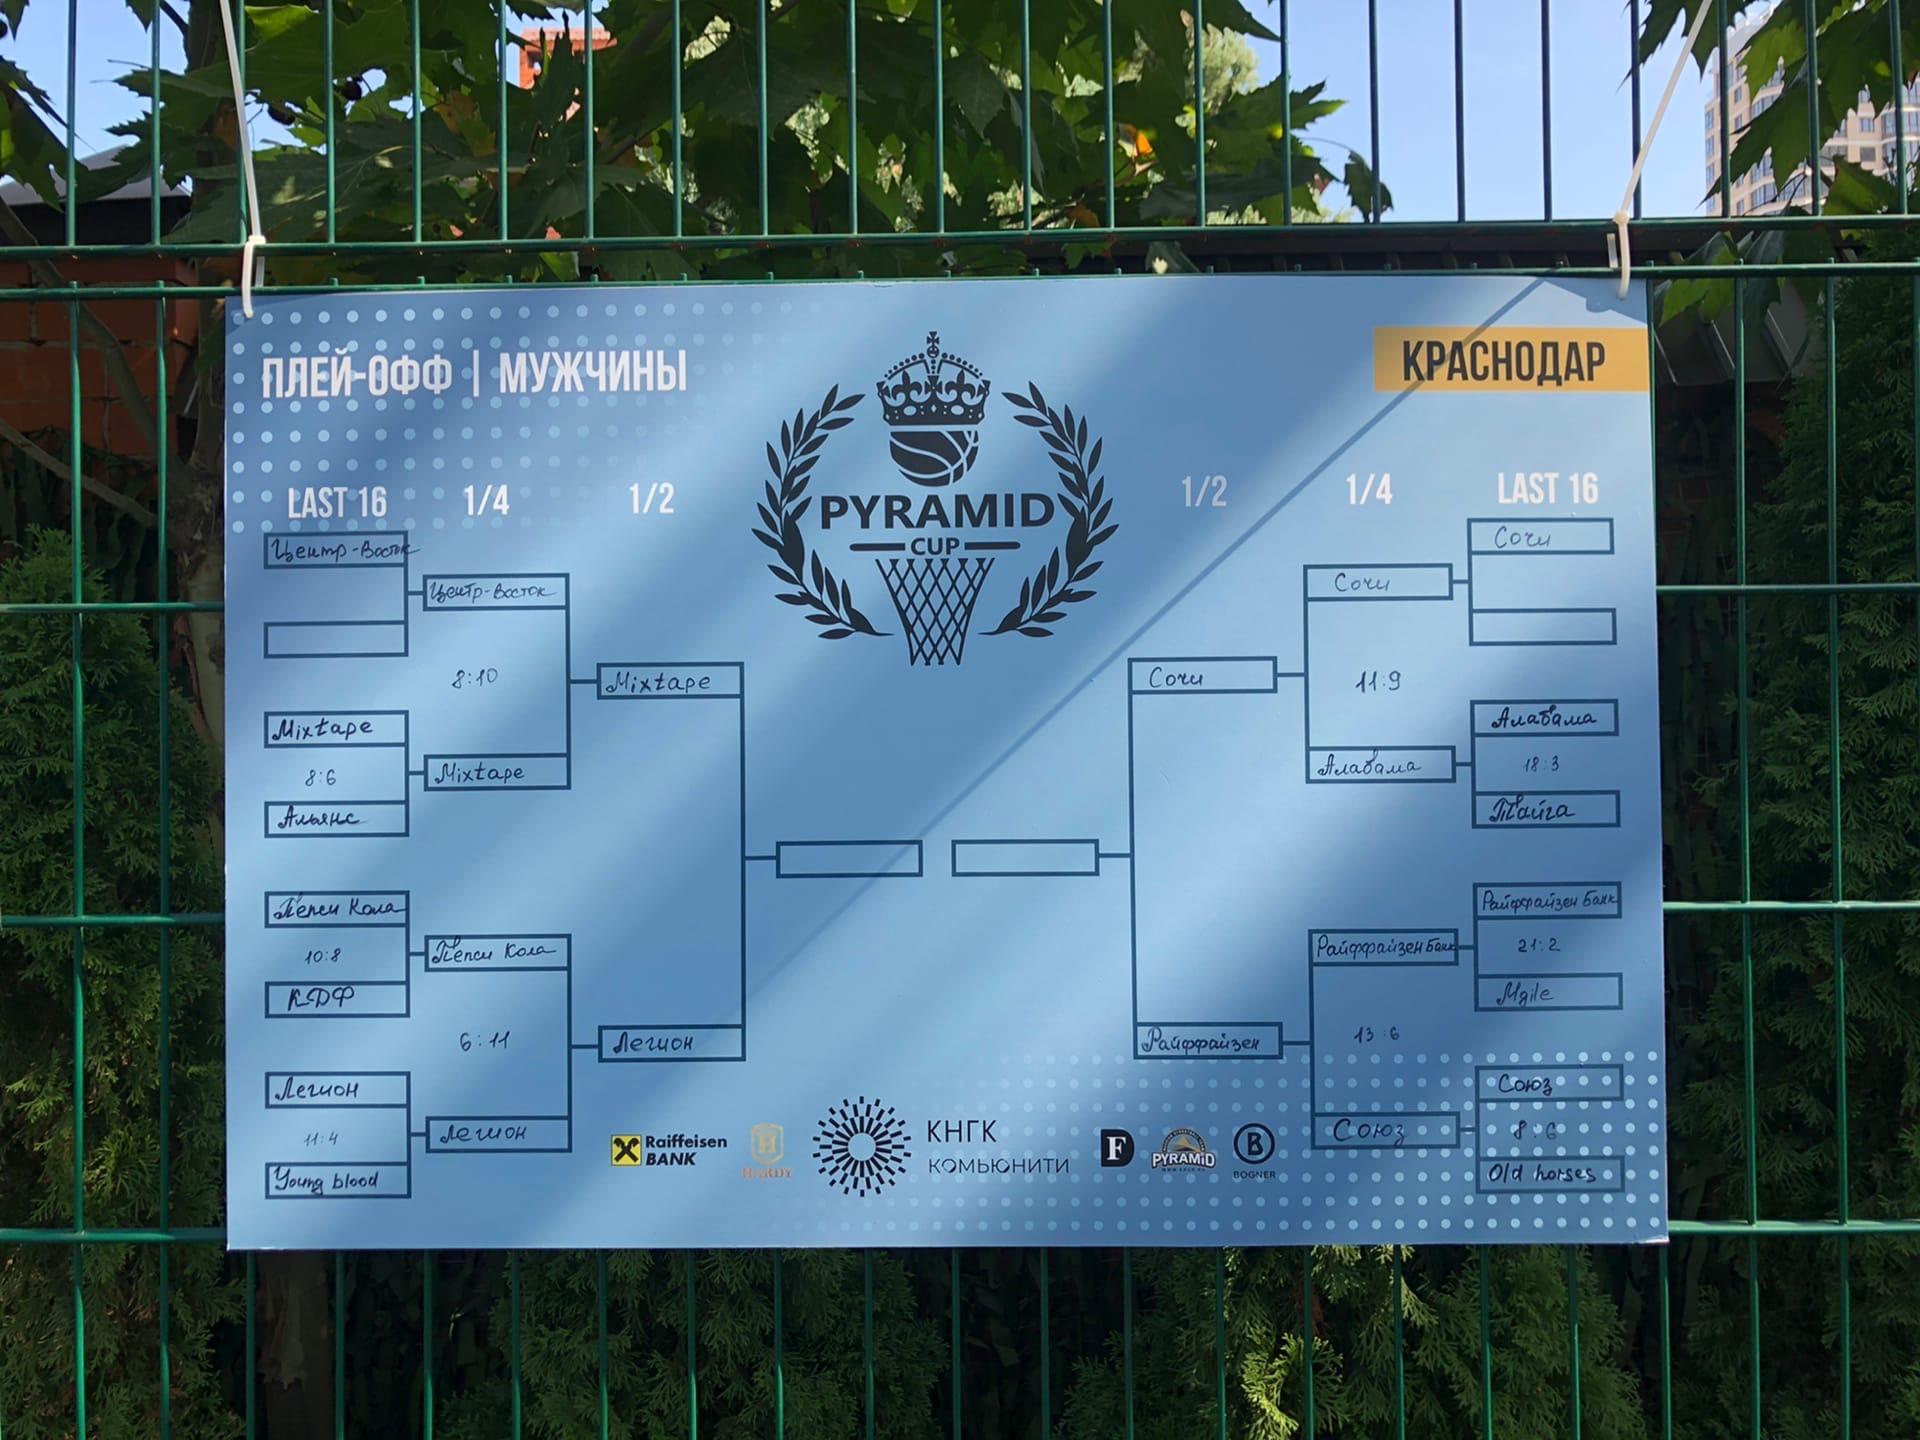 Pyramid Cup 3x3